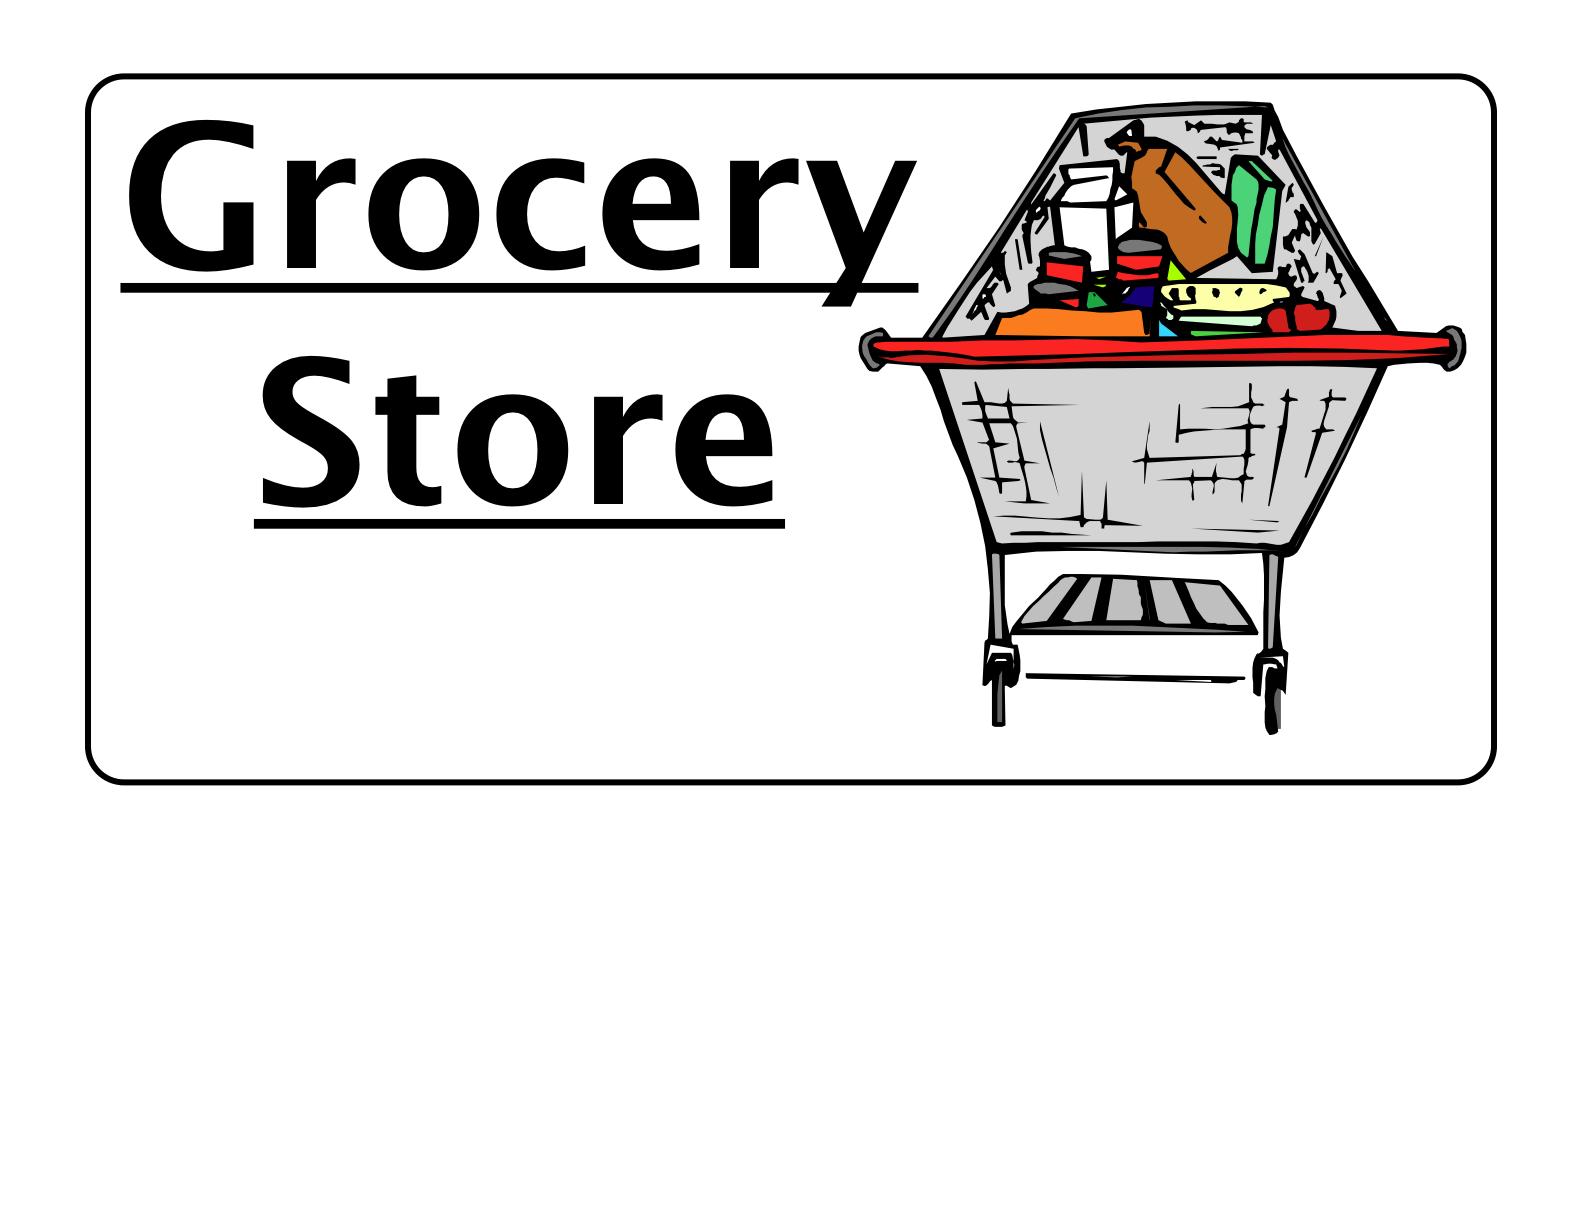 Preschool Is Fun Planning Activities Our Own Grocery